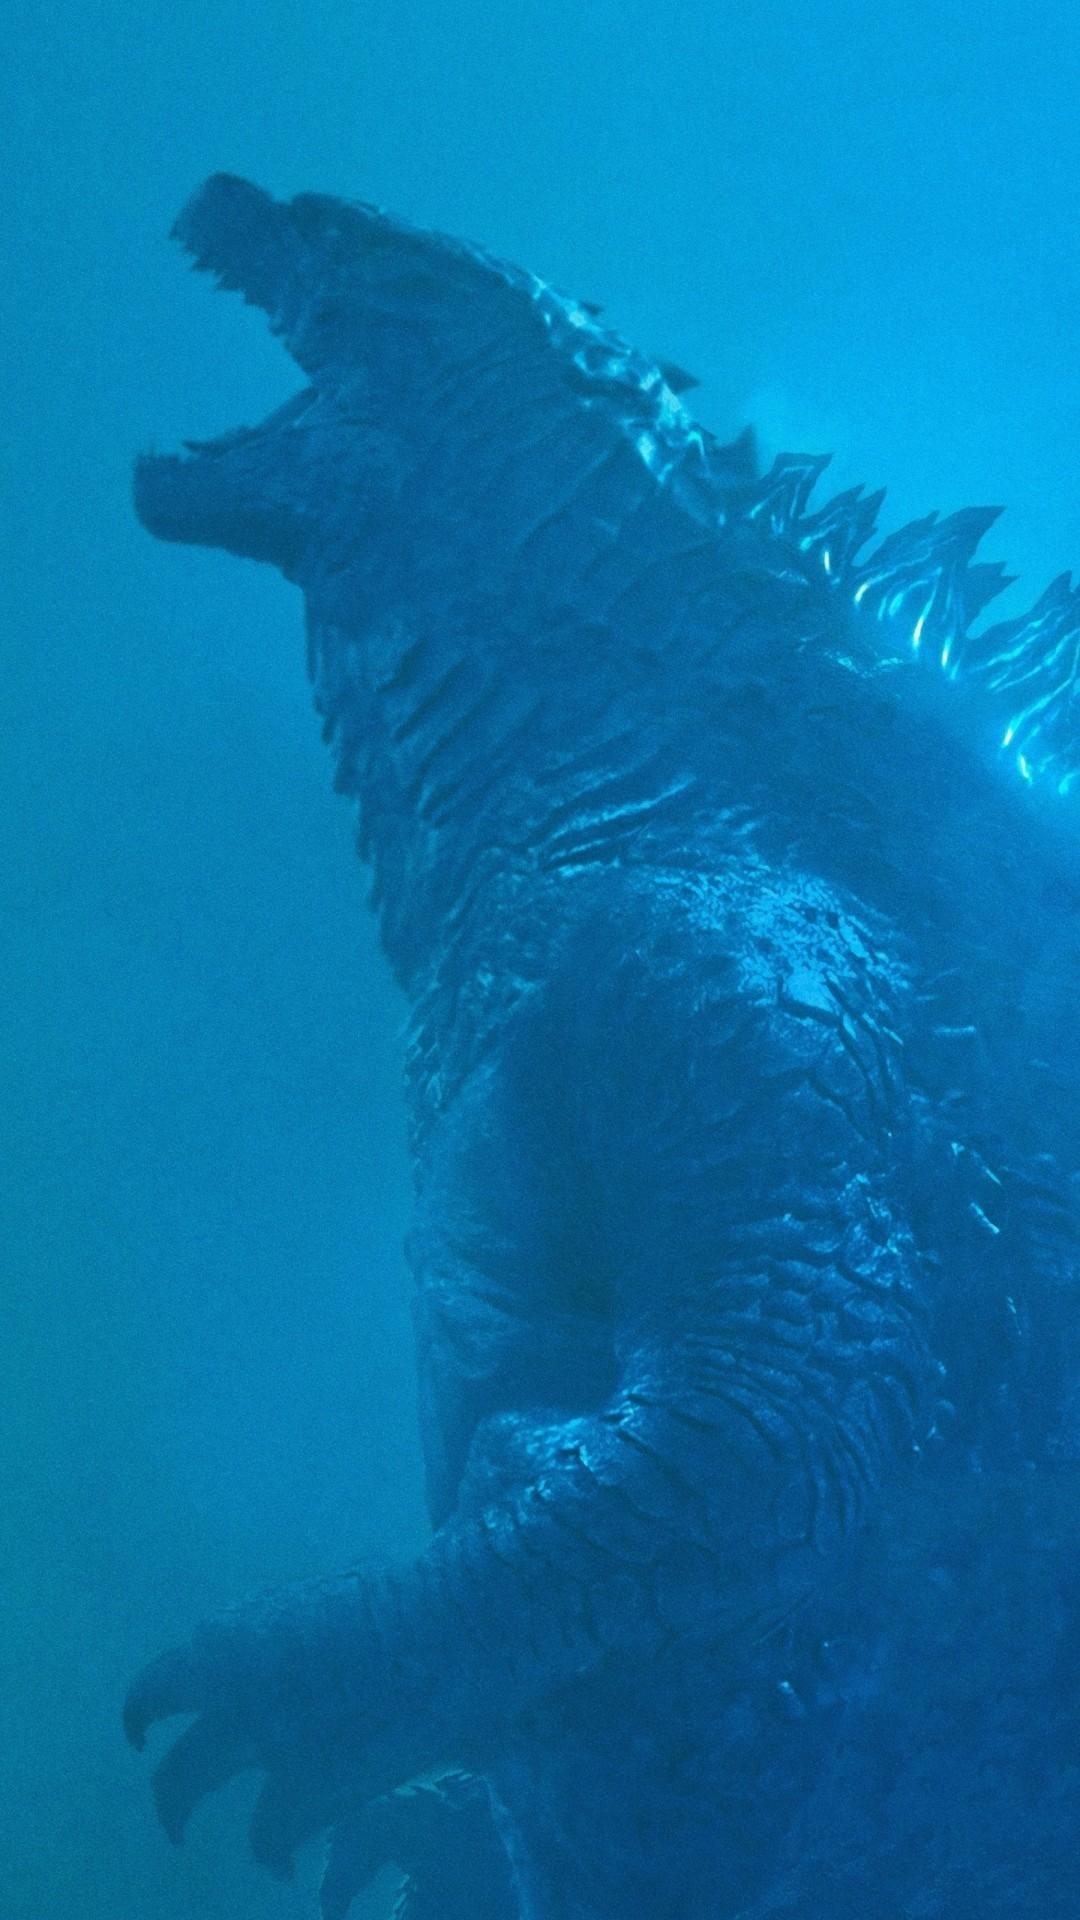 Godzilla iPhone 5 wallpaper